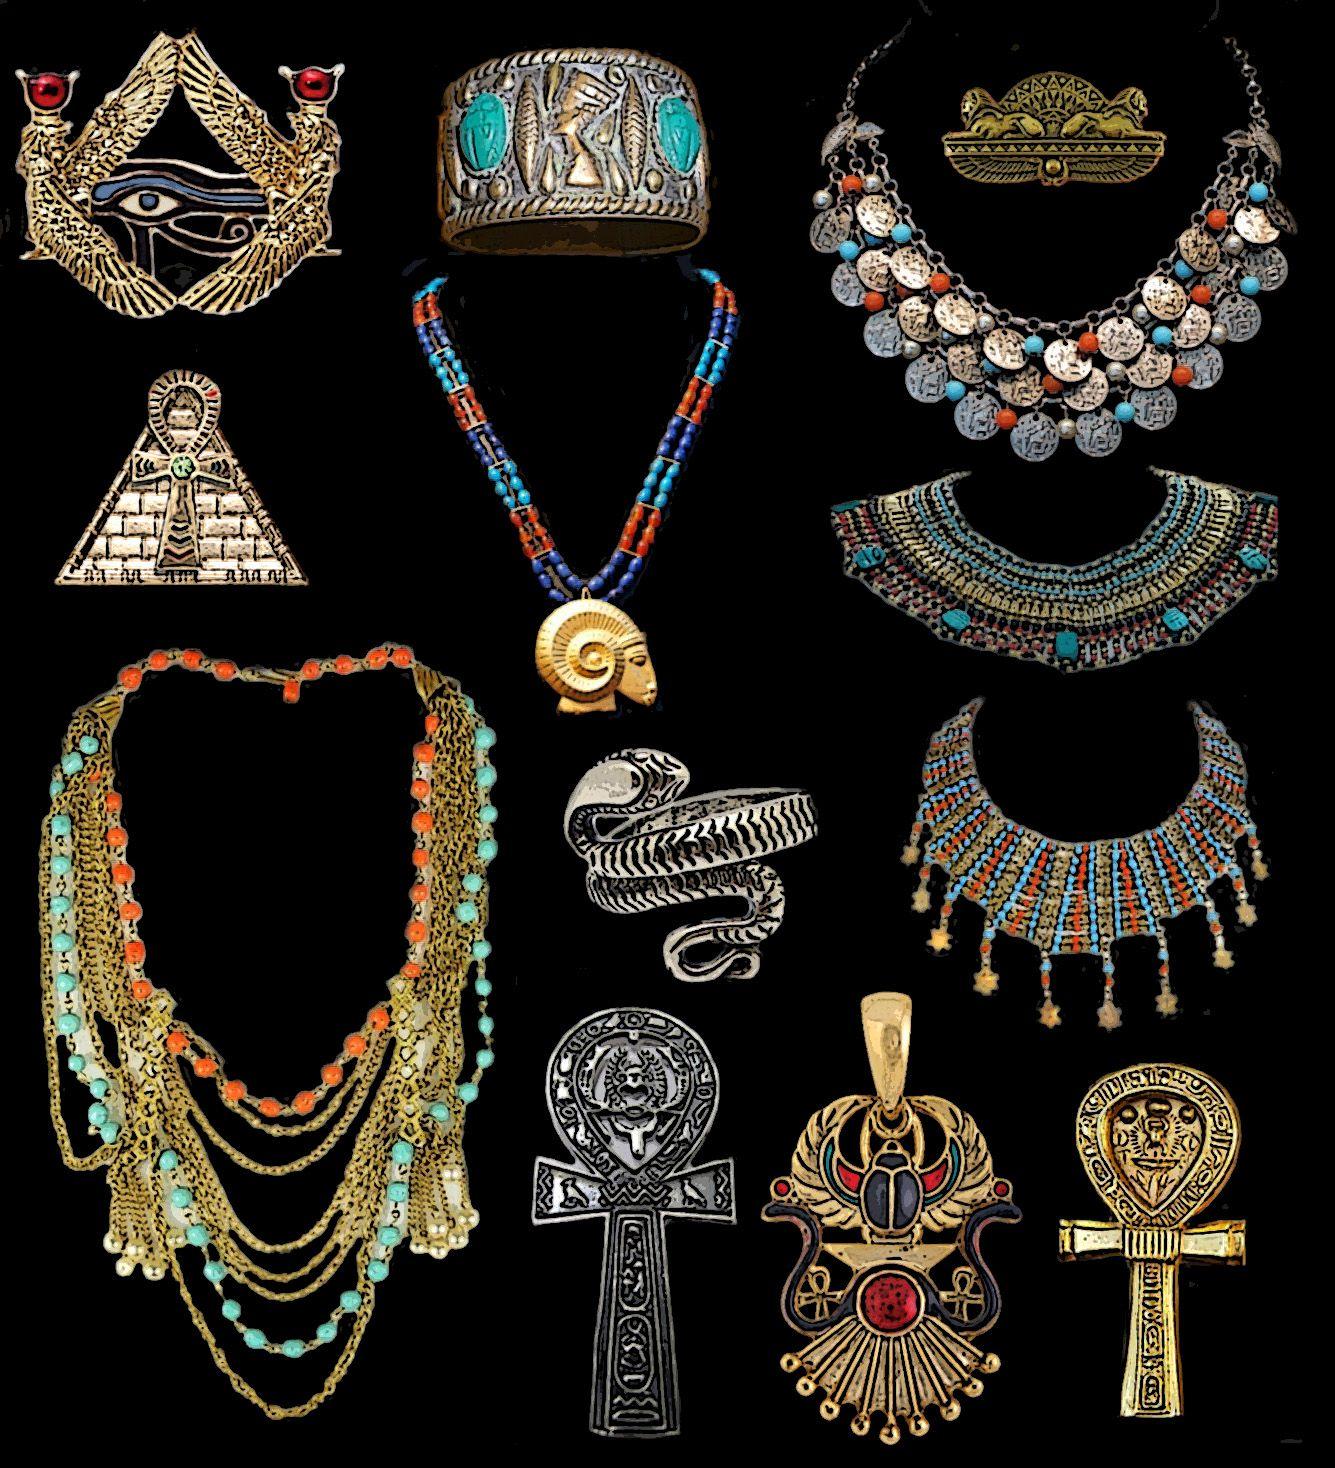 Rare Mystical 1930s Art Deco Egyptian Ritual Pharaoh Glass Necklace Hieroglyphs Price Remains Stable Art Nouveau/art Deco 1895-1935